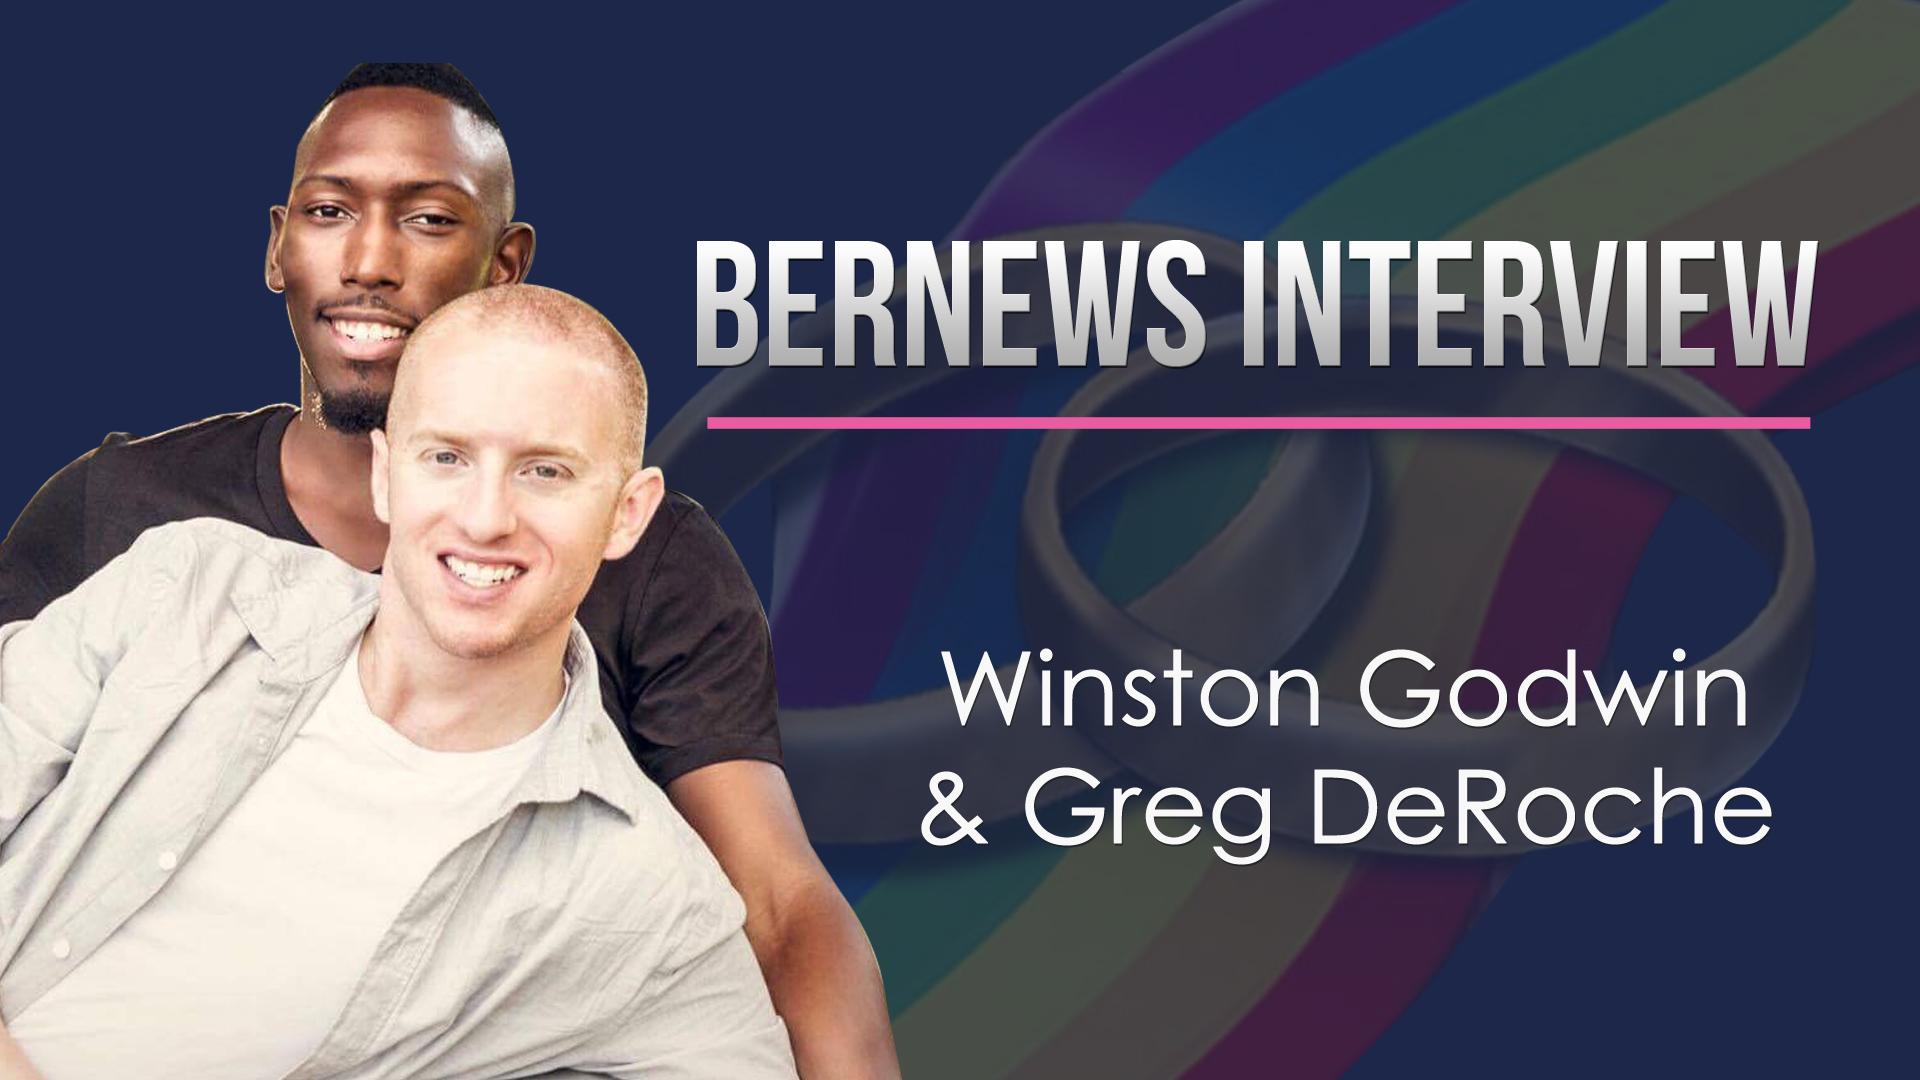 YTPH Bernews Interview with Winston Godwin 1 ssm